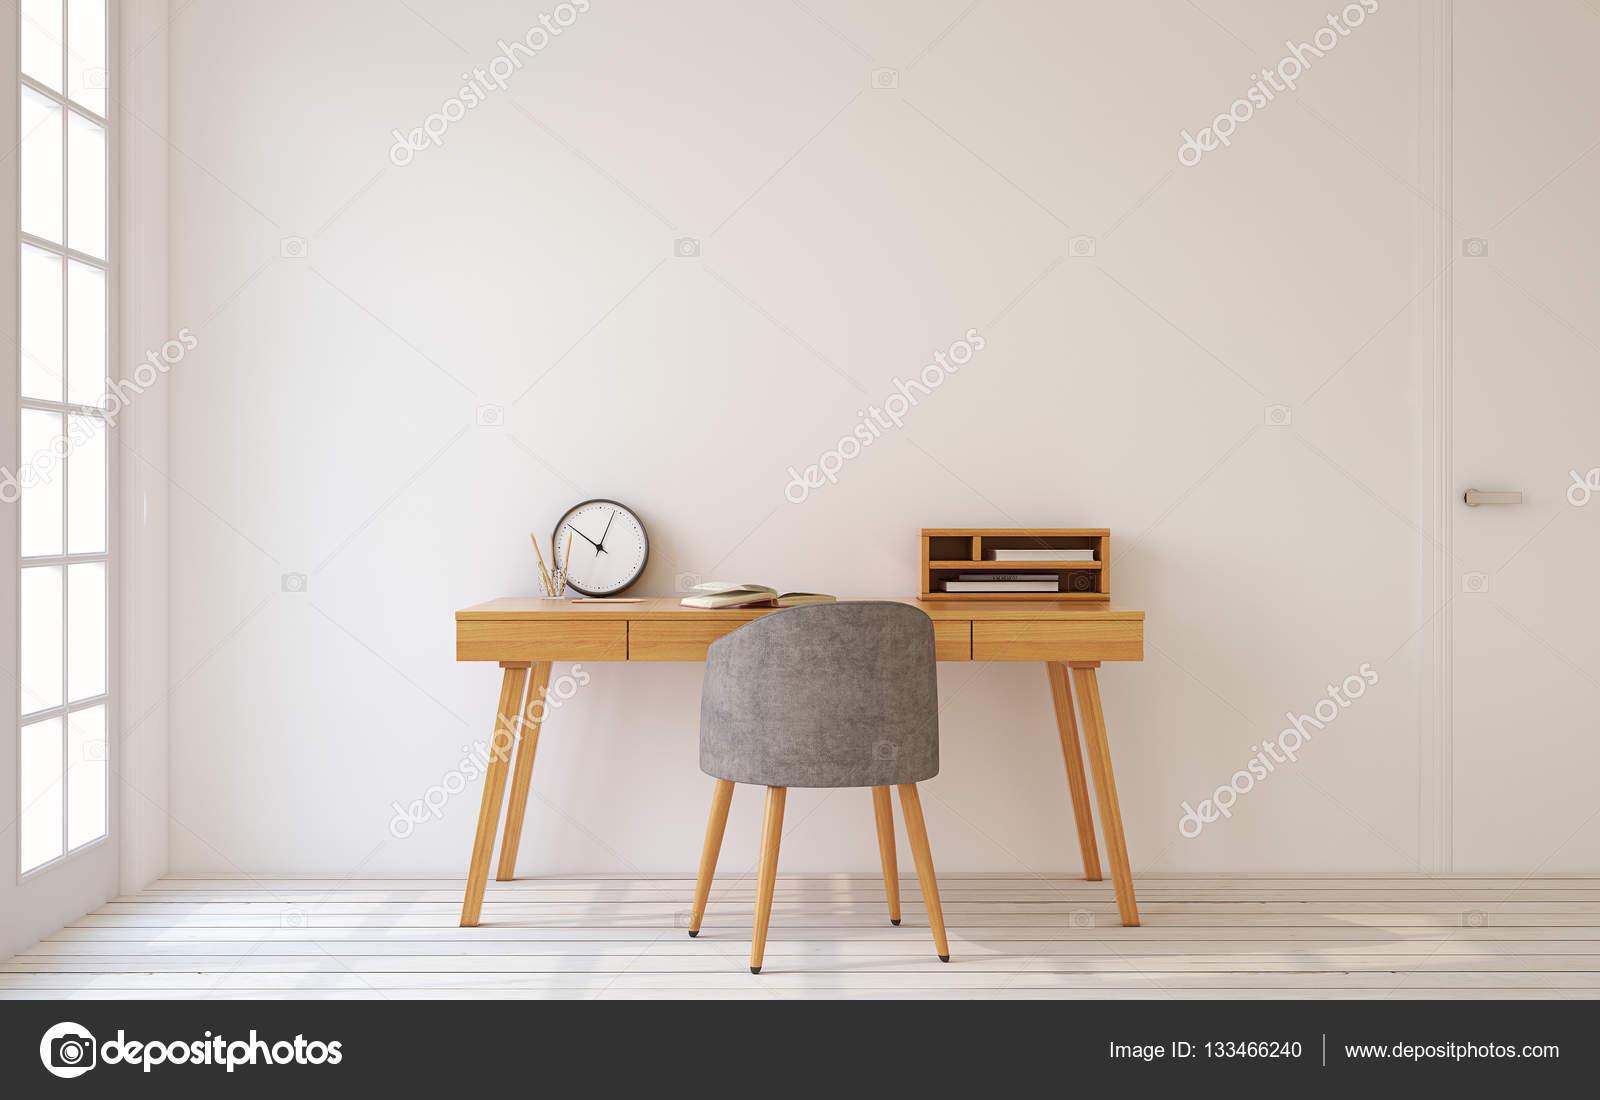 Kantoor aan huis interieur 3d render stockfoto poligonchik 133466240 - Kantoor aan huis outs ...